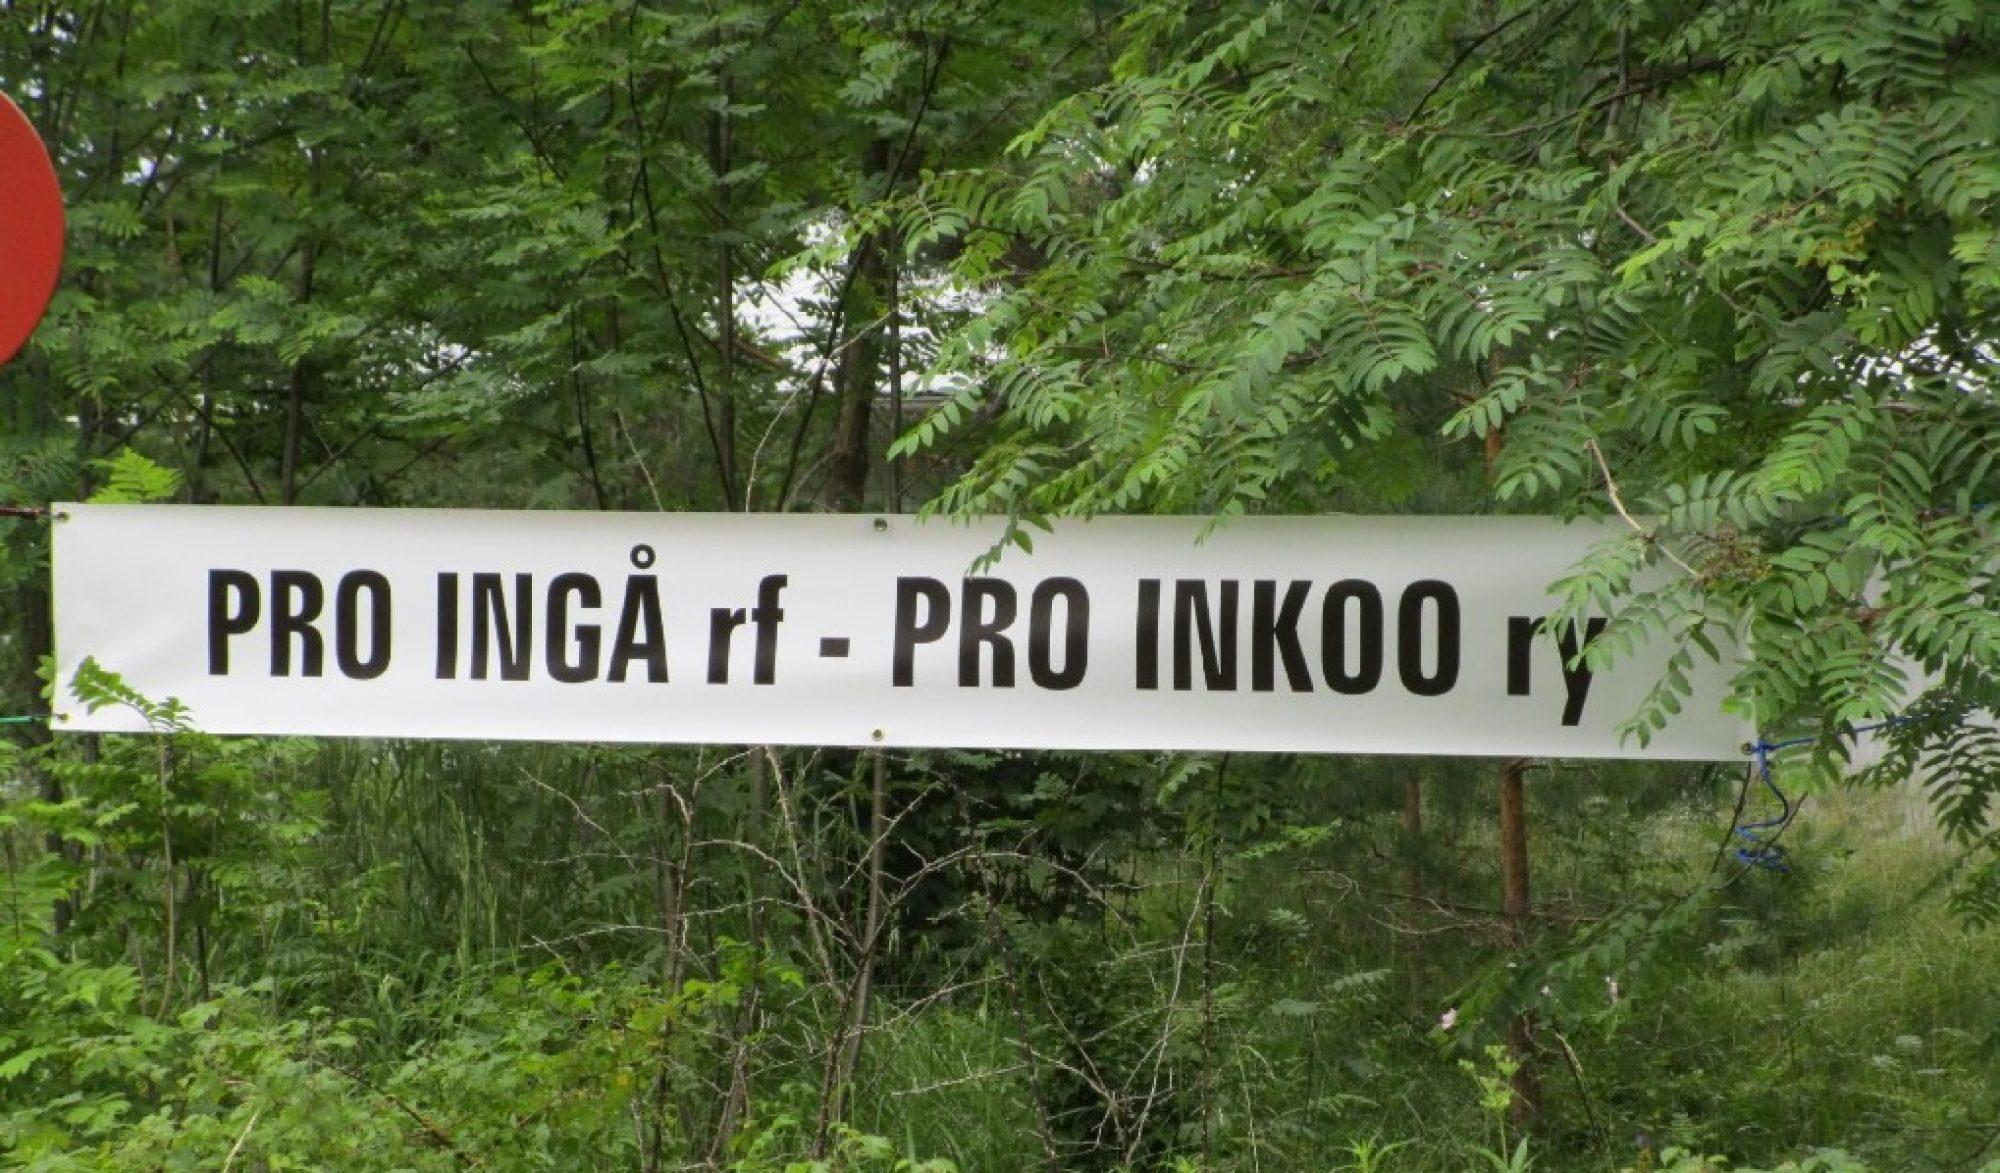 Pro Ingå rf